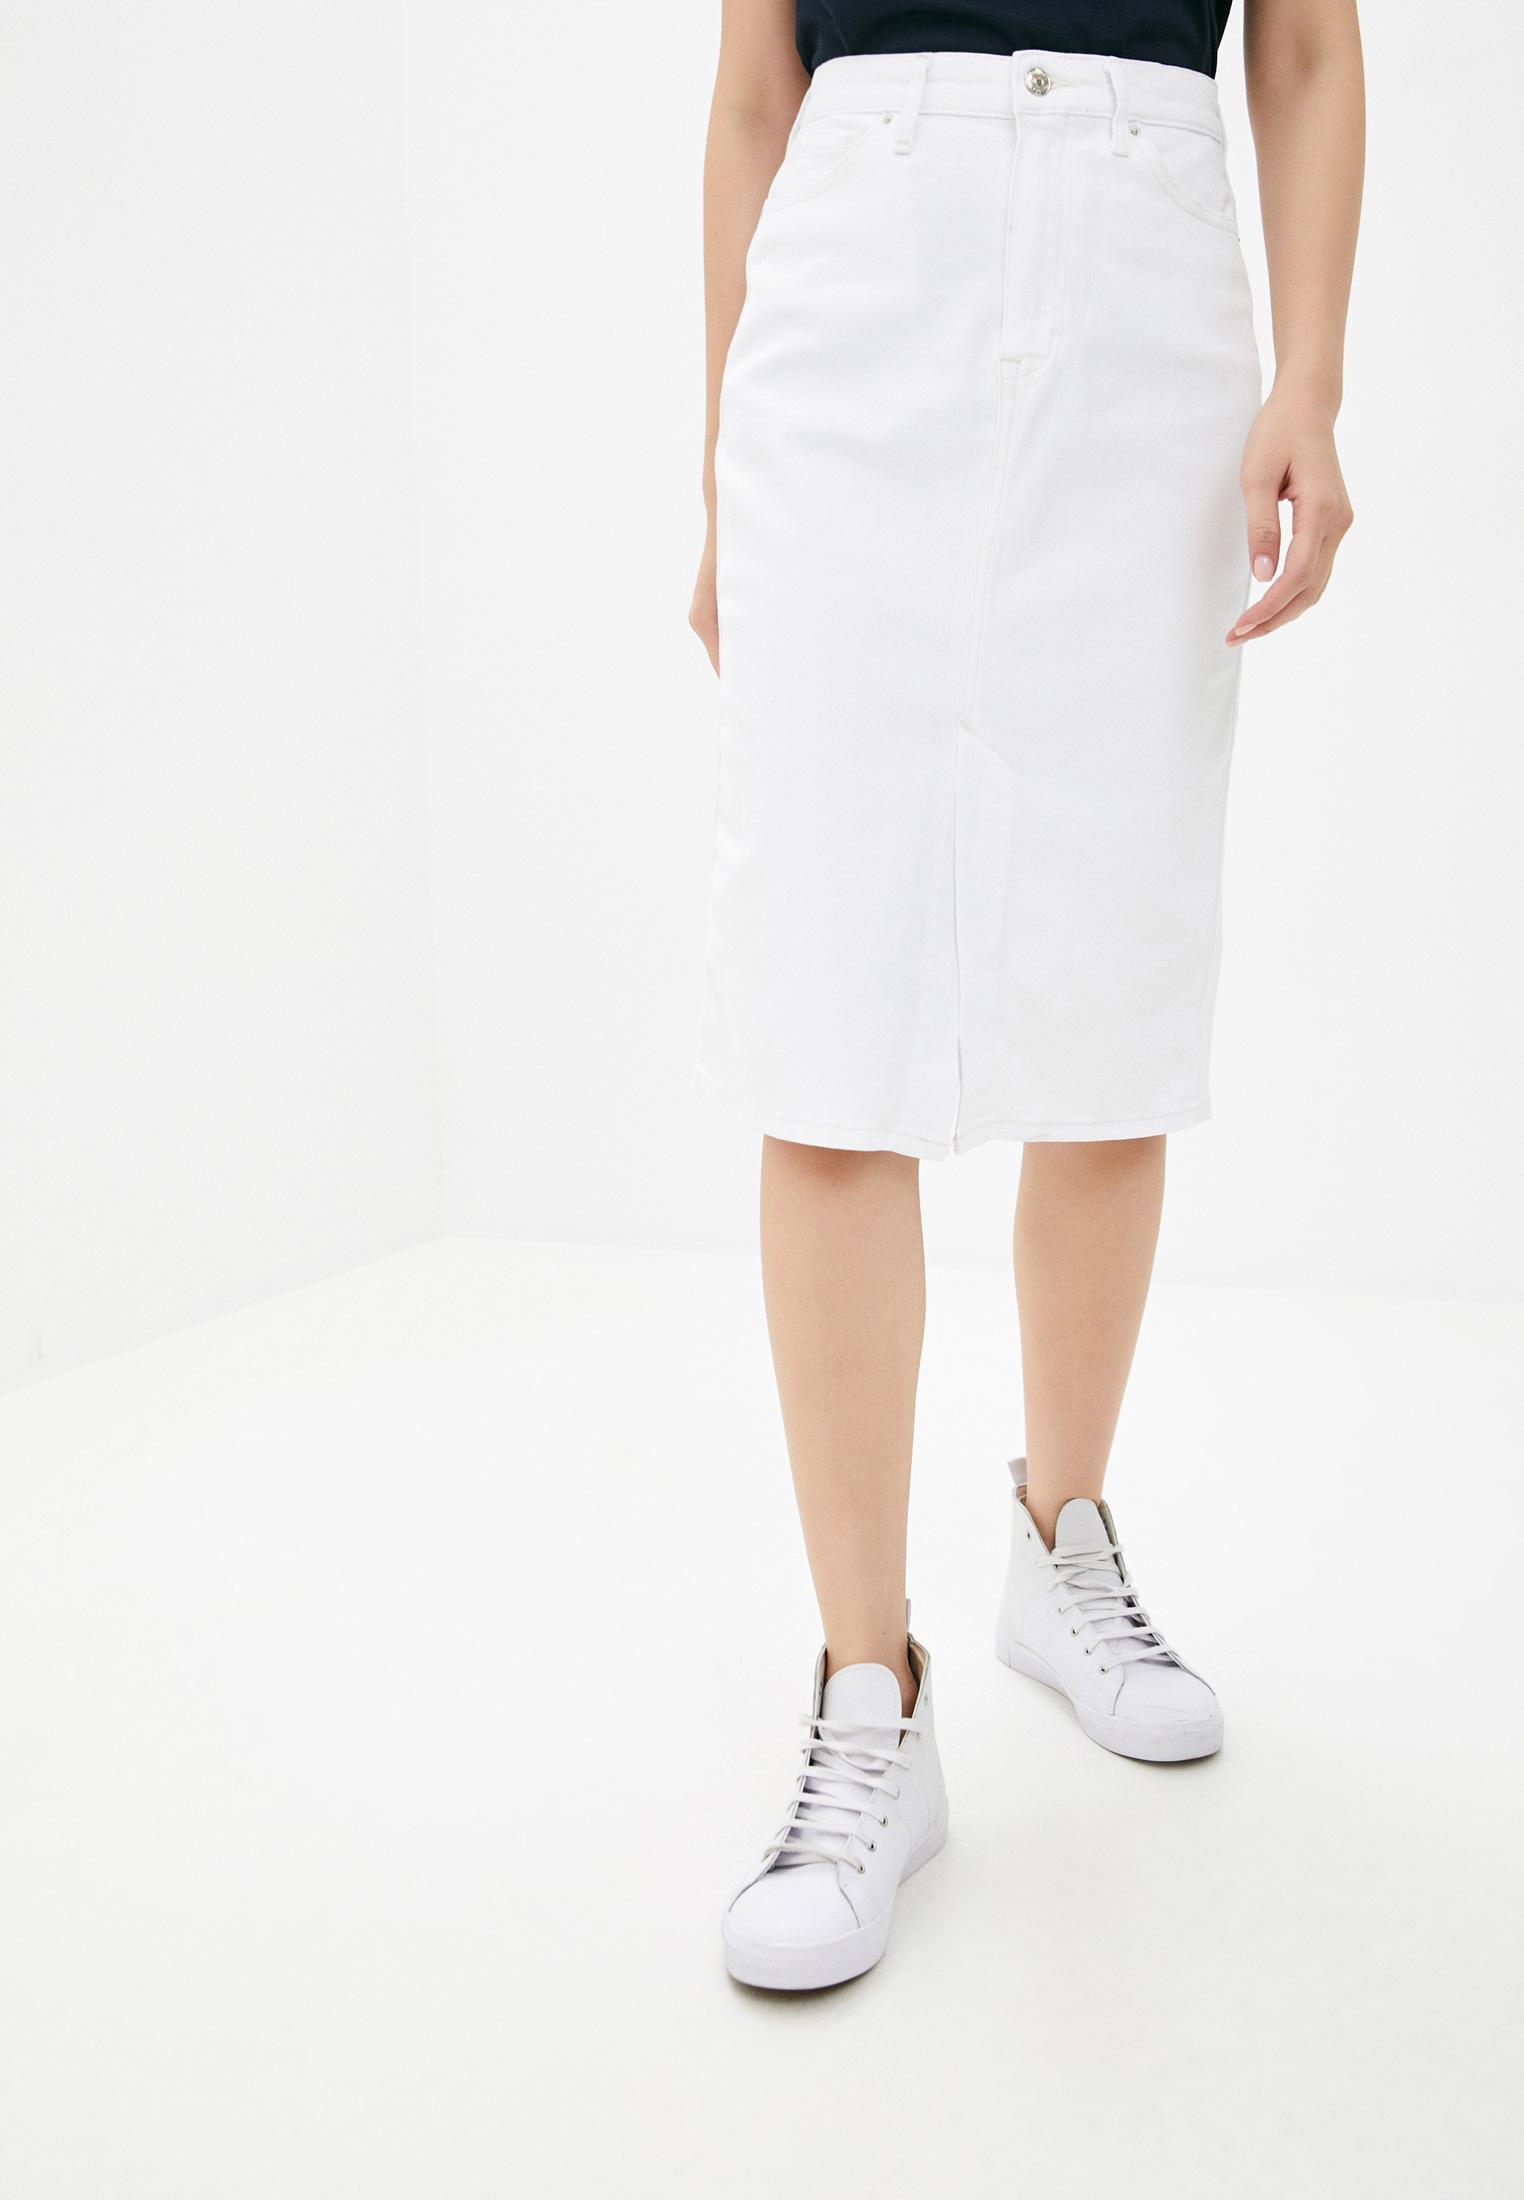 Джинсовая юбка Tommy Hilfiger (Томми Хилфигер) WW0WW28084